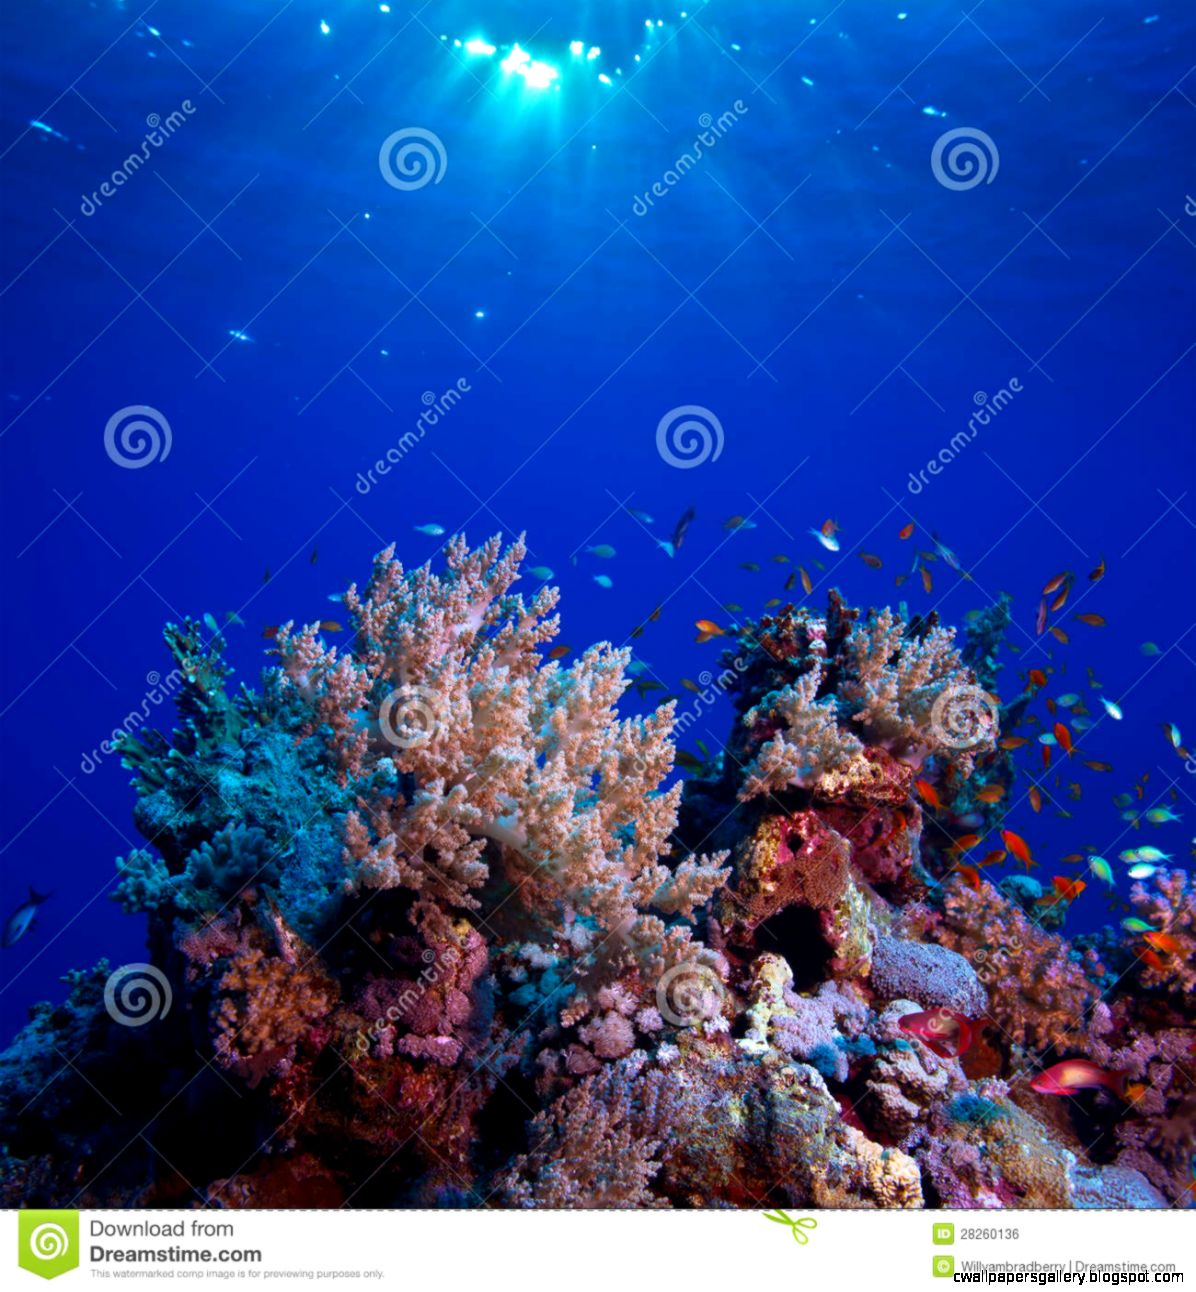 Underwater Scenery Beautiful C Reef Full Of Colorful Fish